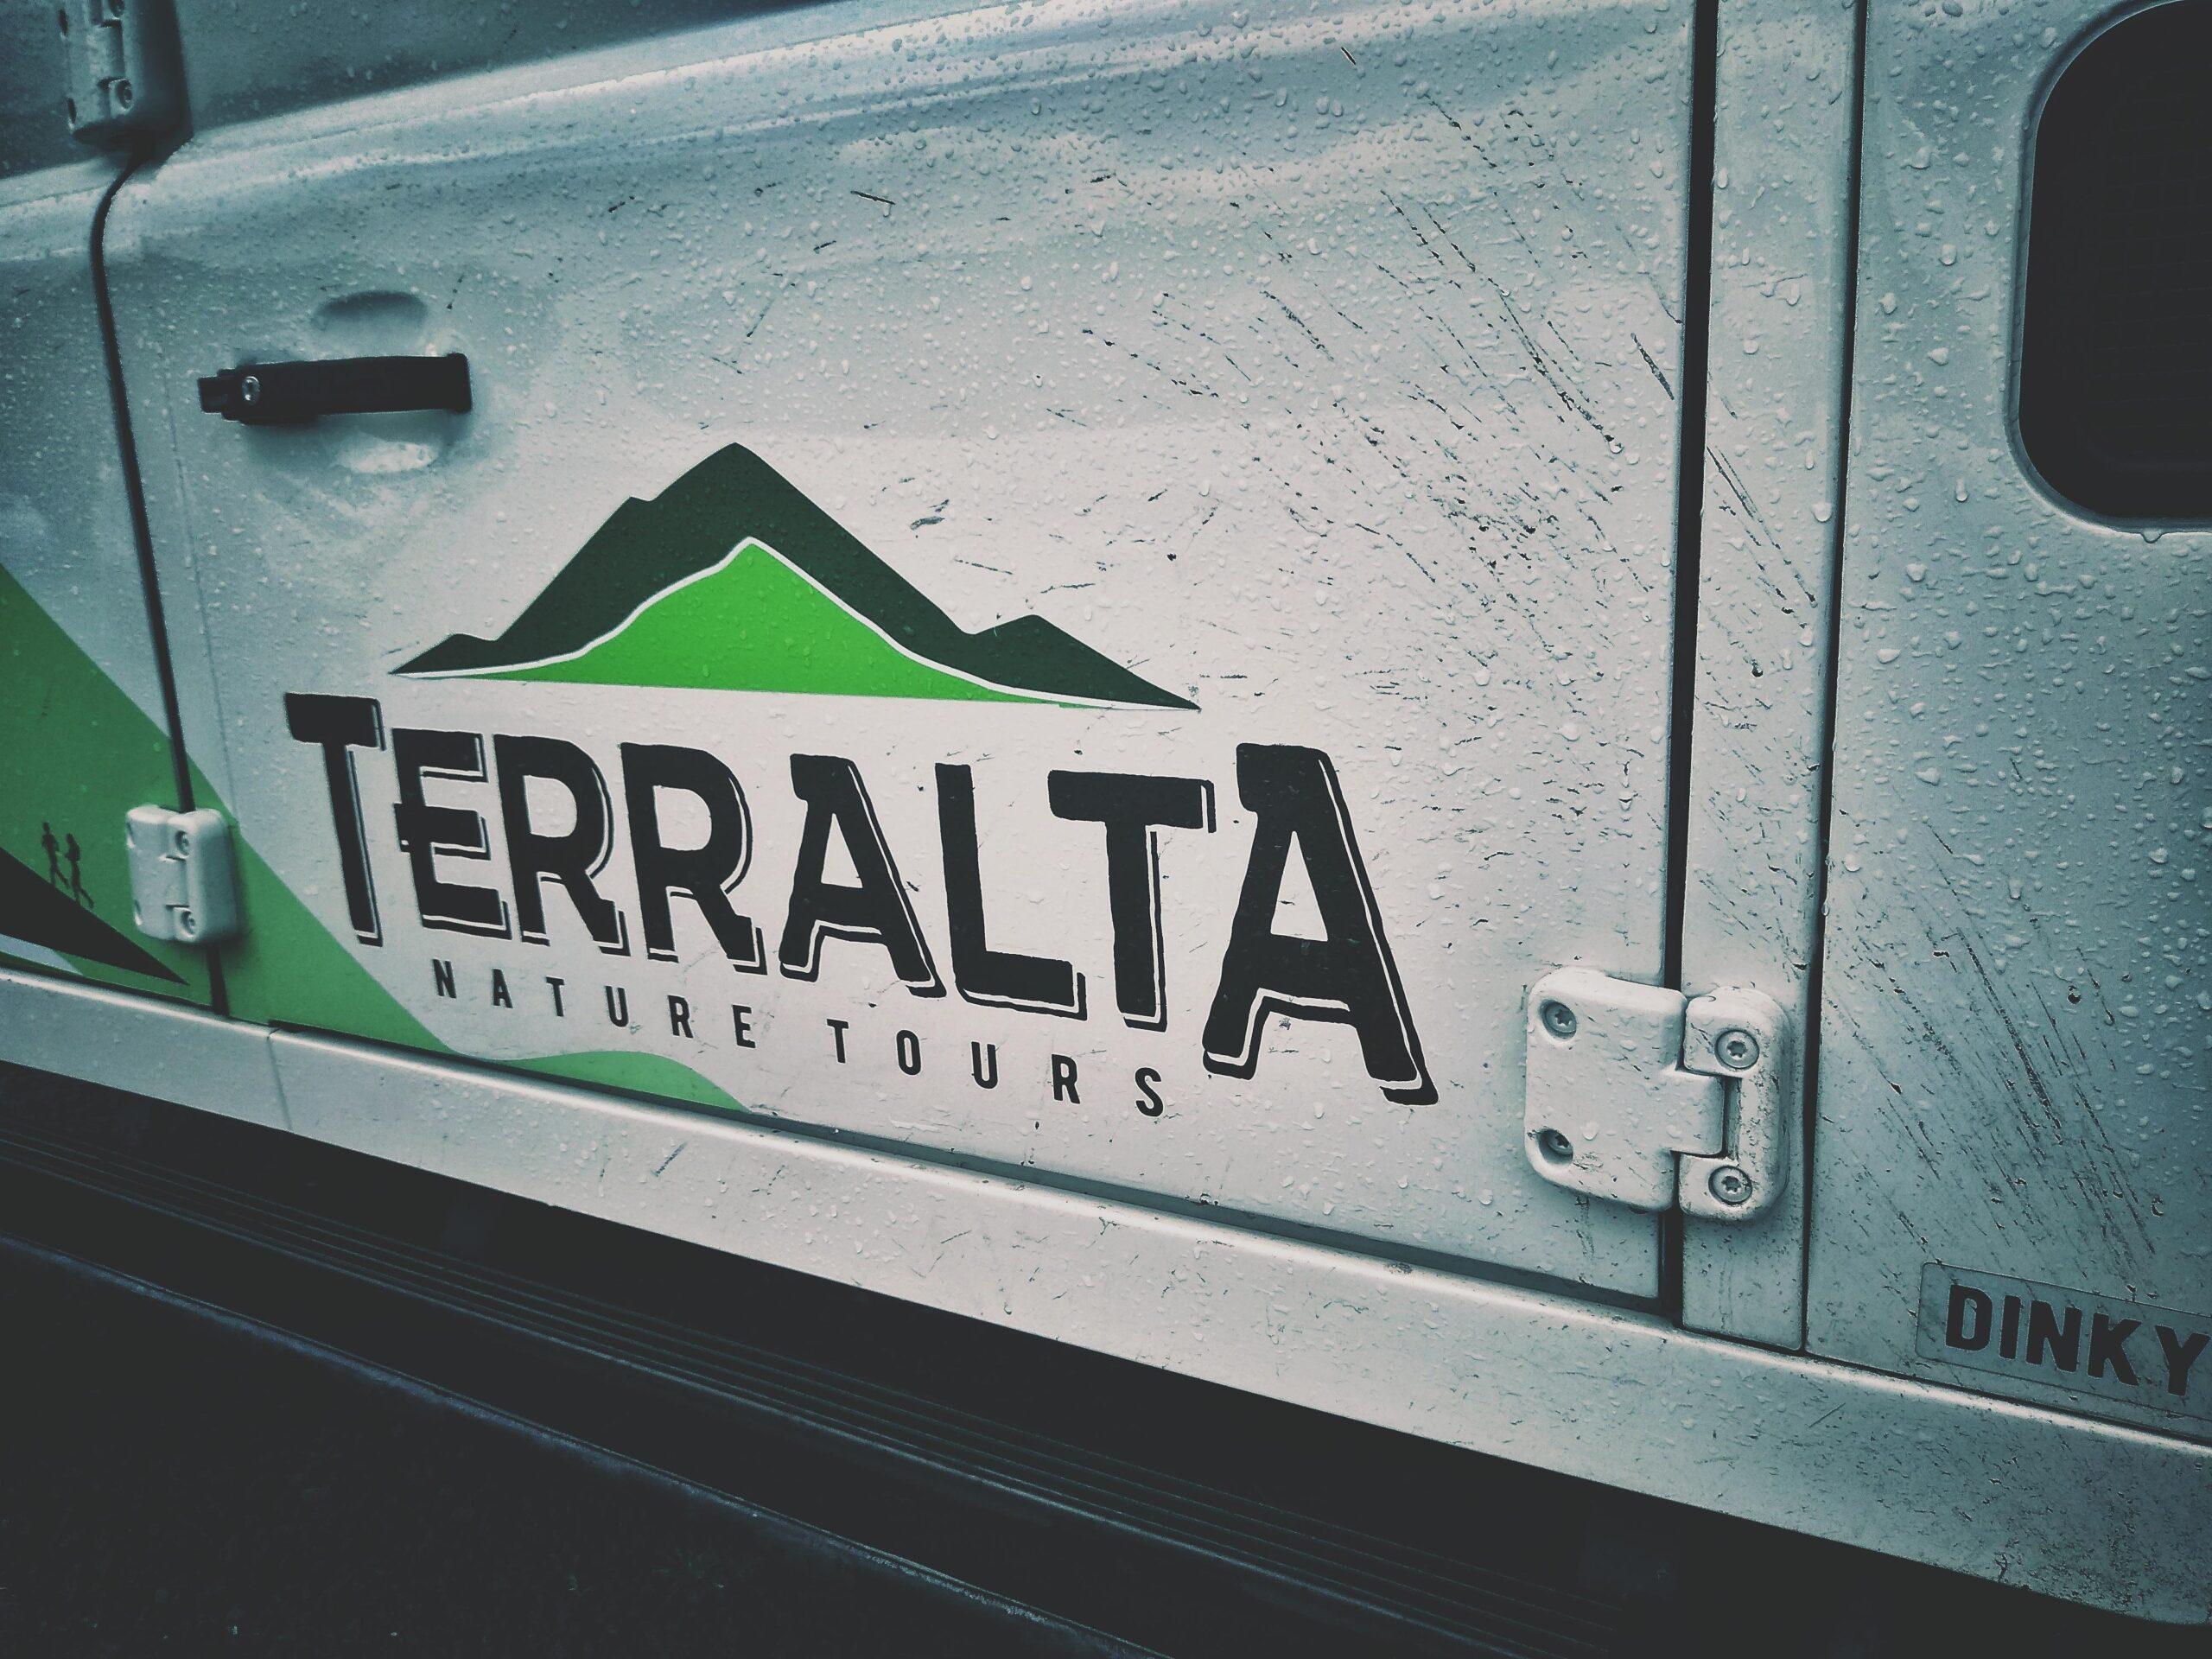 Terralta Nature Tours